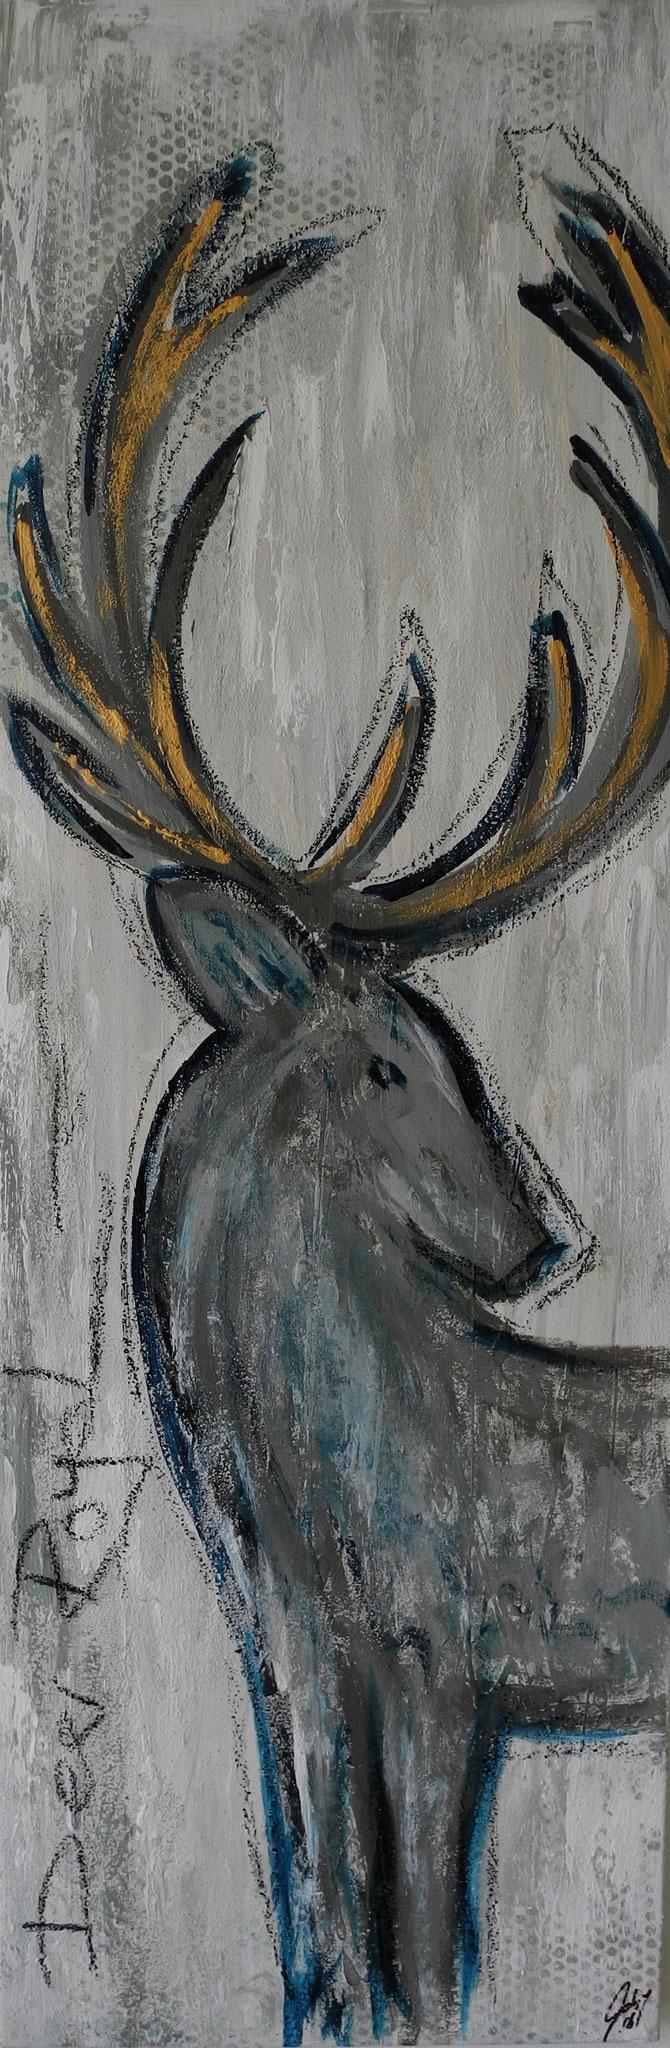 Deer Royal, 2016 150 x 50 cm